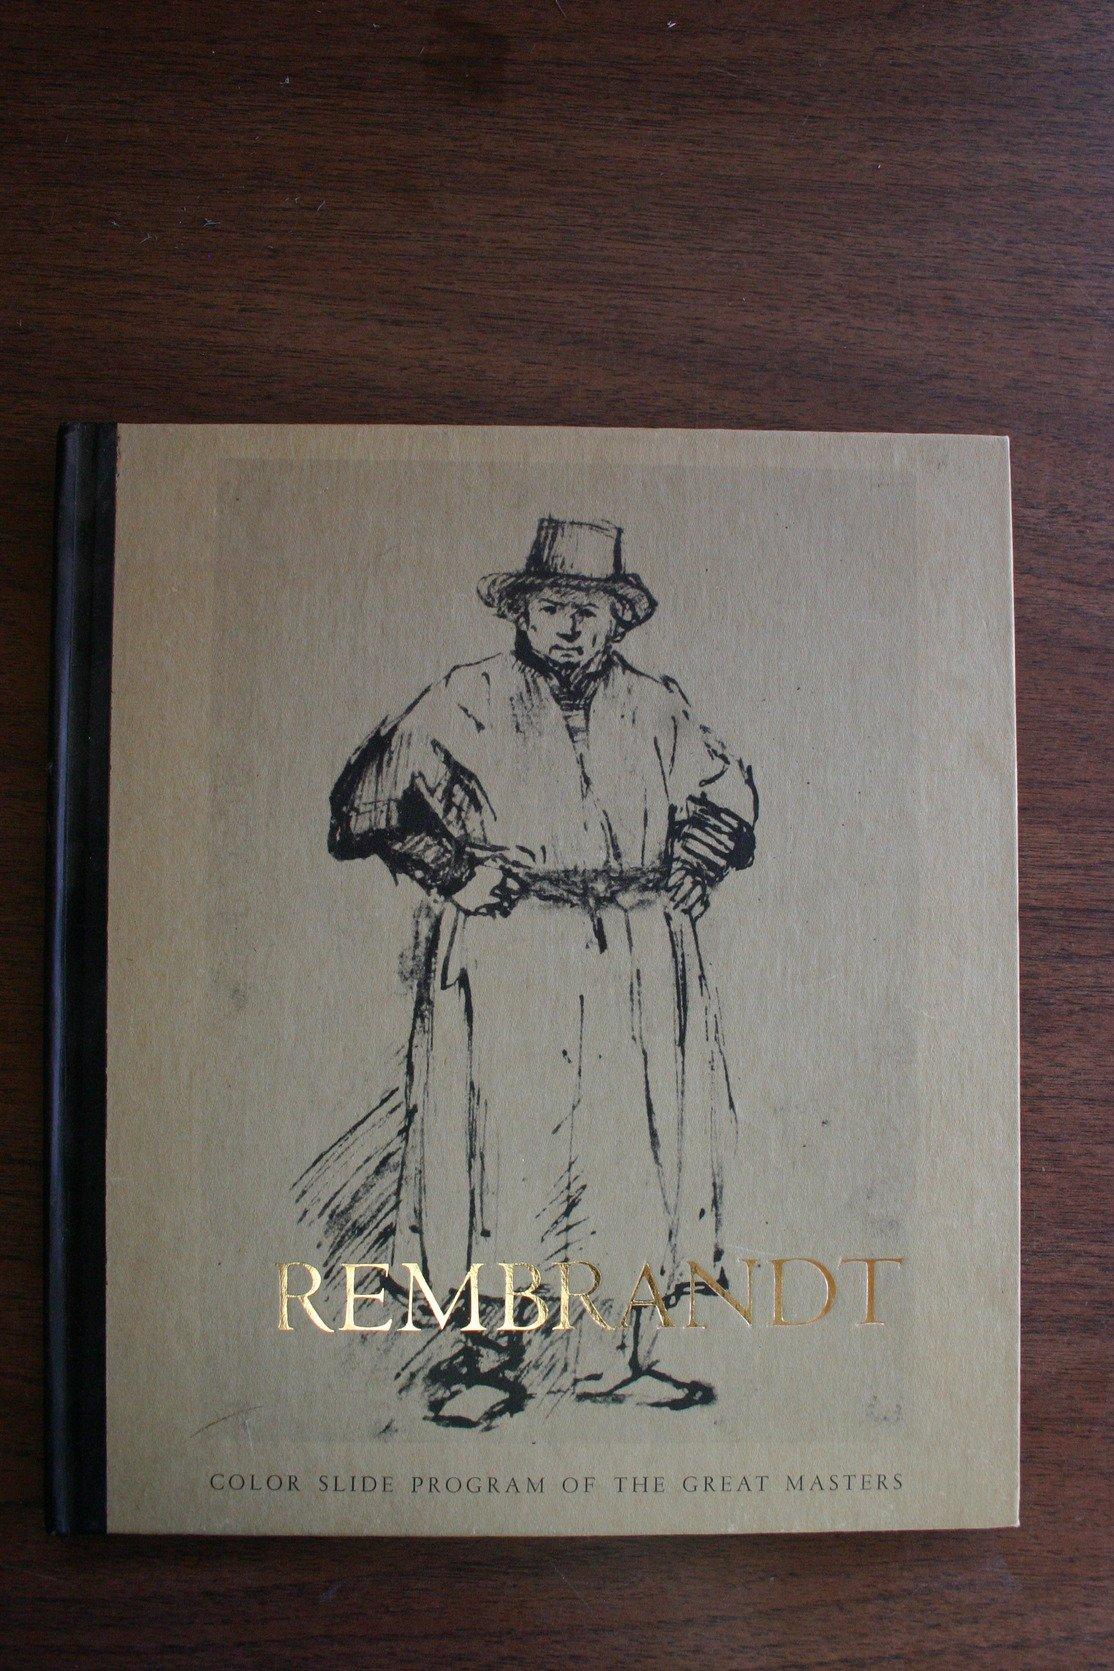 rembrandt color slide program of the great masters